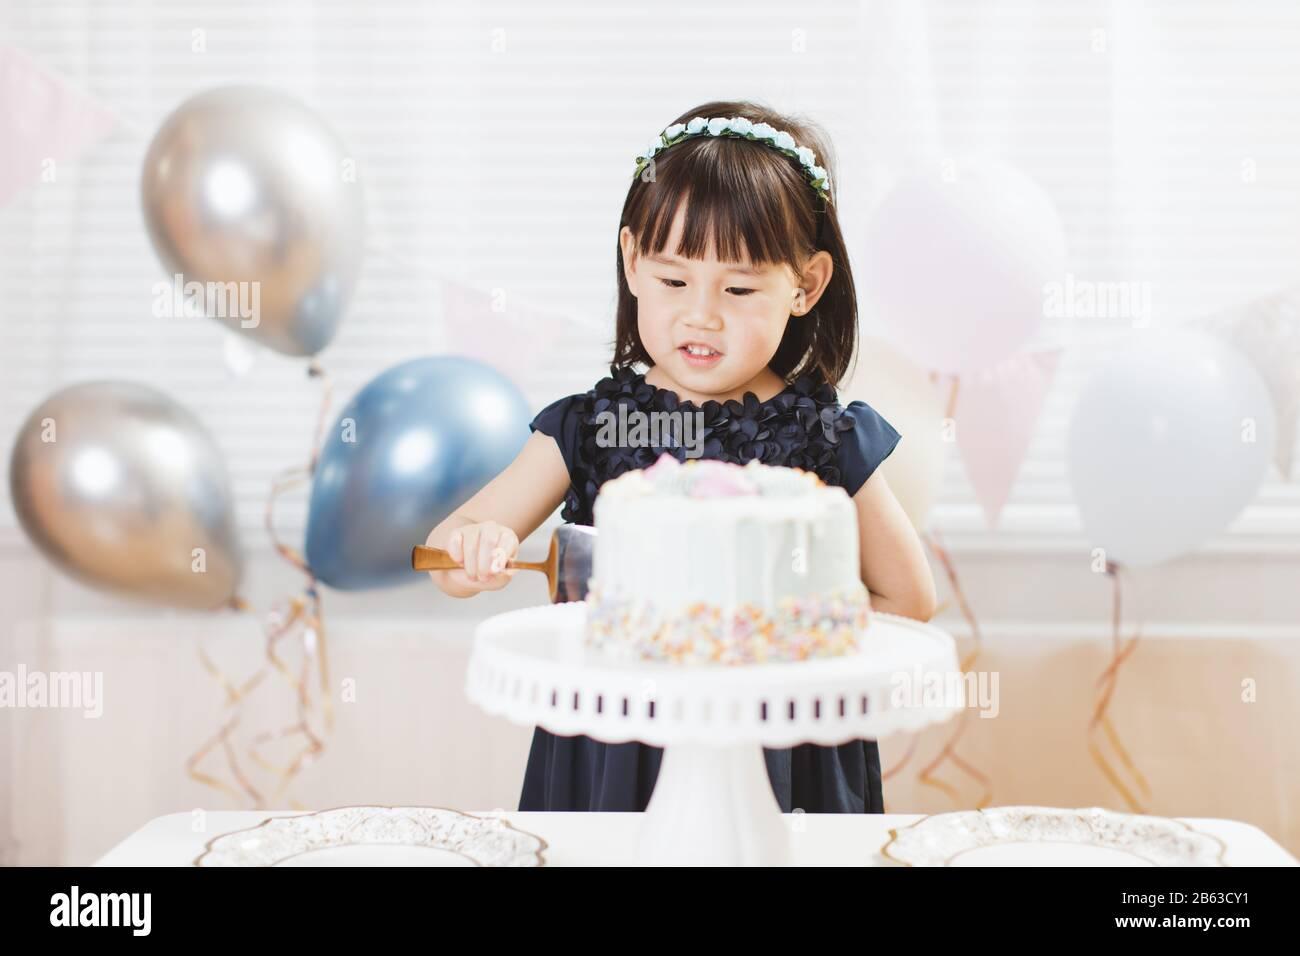 Fabulous Toddler Girl Cut Birthday Cake Celebrating Her Birthday At Home Birthday Cards Printable Benkemecafe Filternl